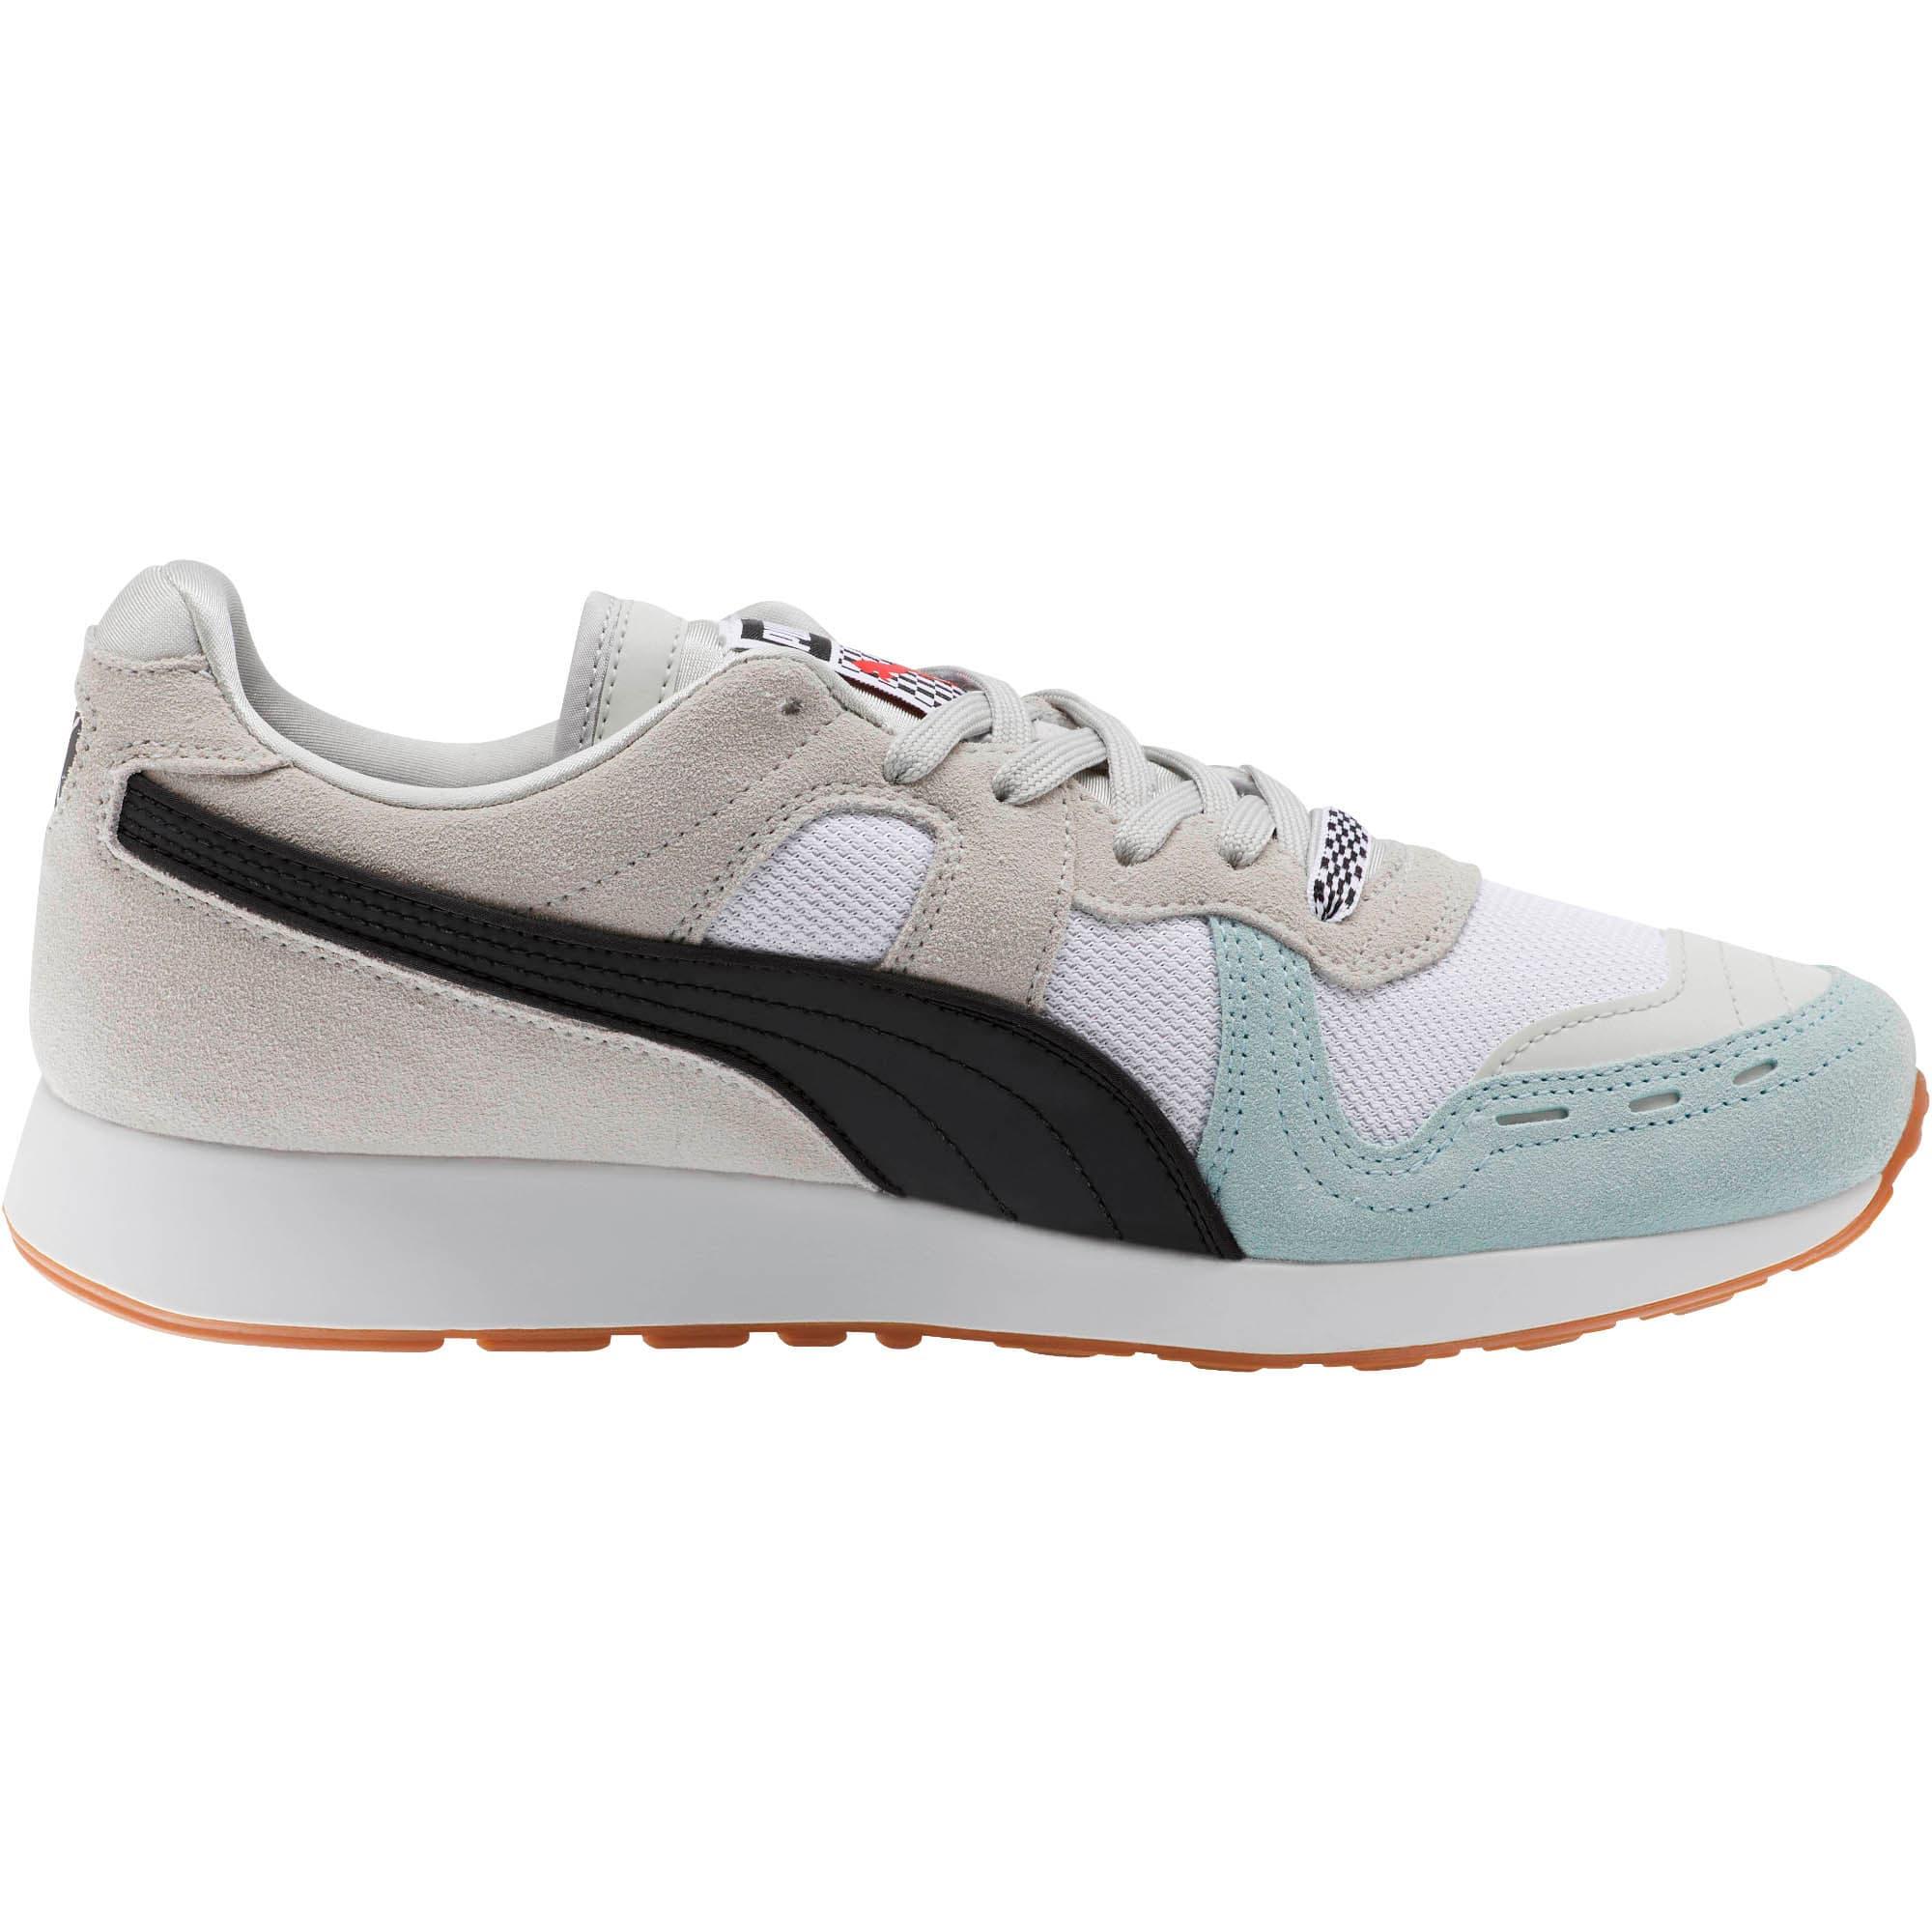 Miniatura 4 de Zapatos deportivos RS-100 Racing Flag, Glacier Gray-Puma White, mediano